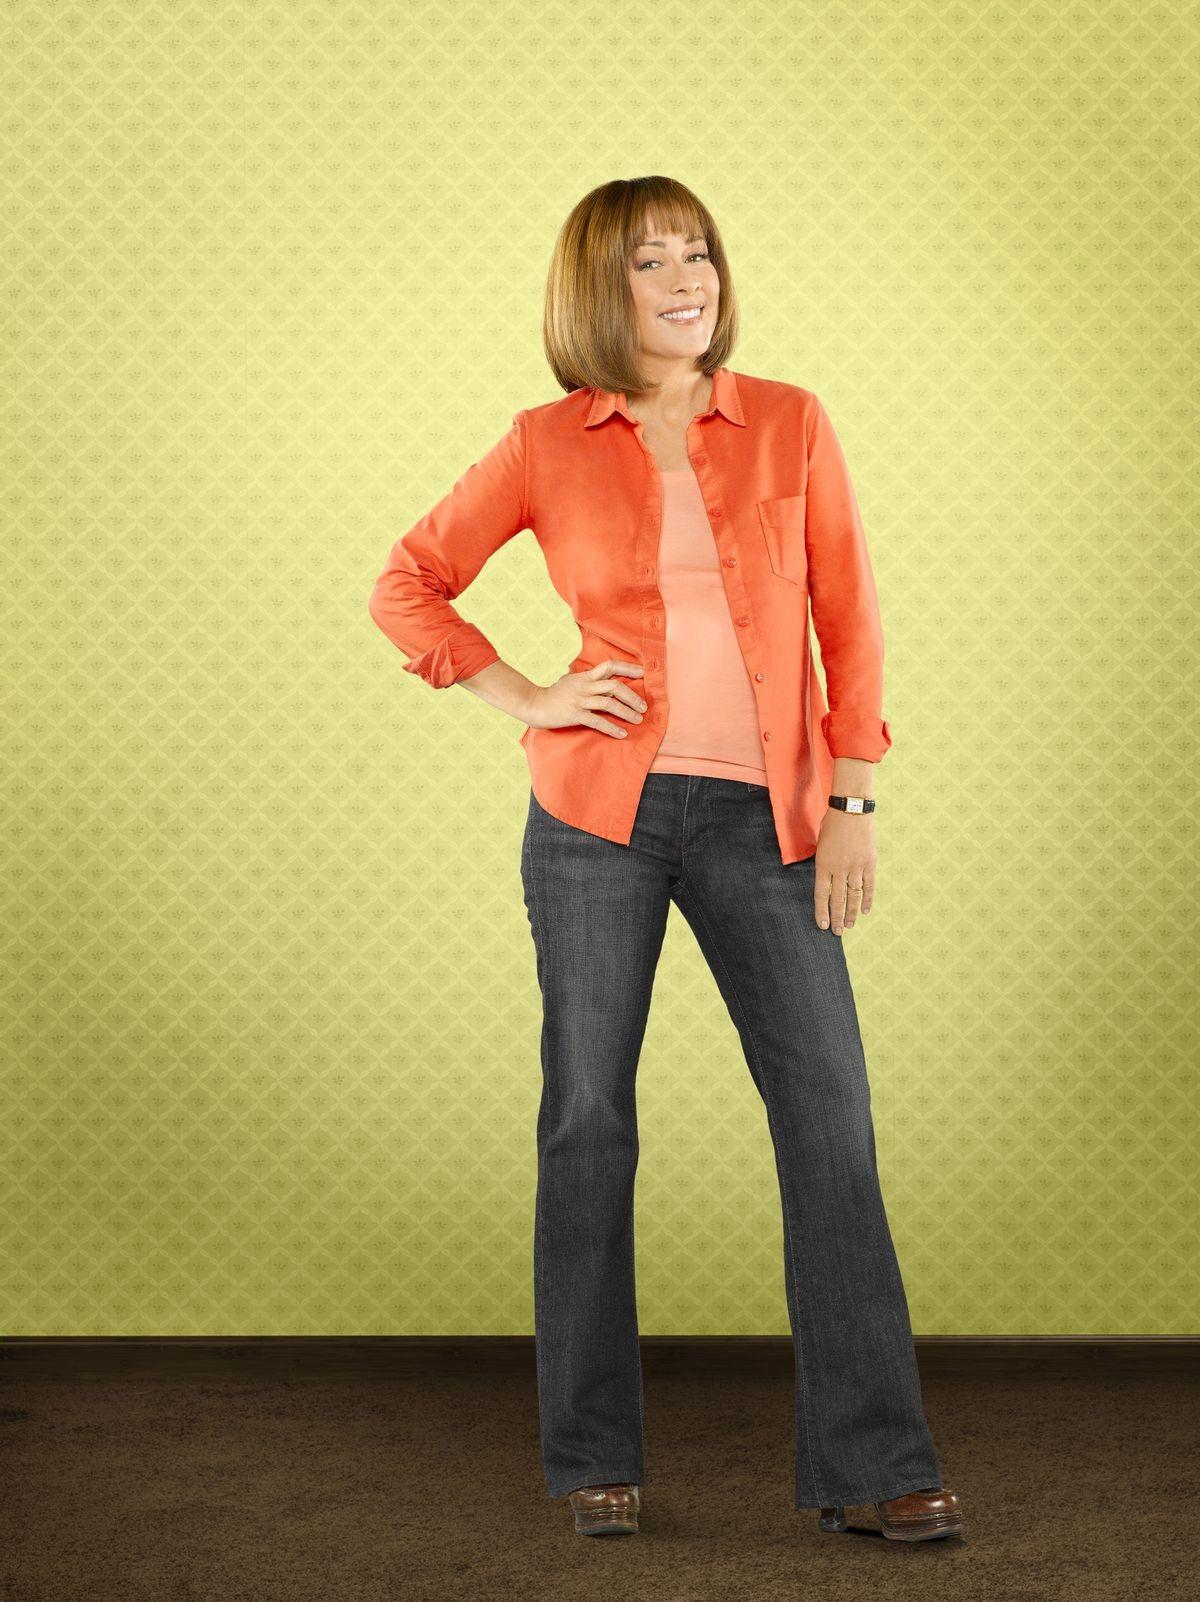 Patricia Heaton as Frankie Heck